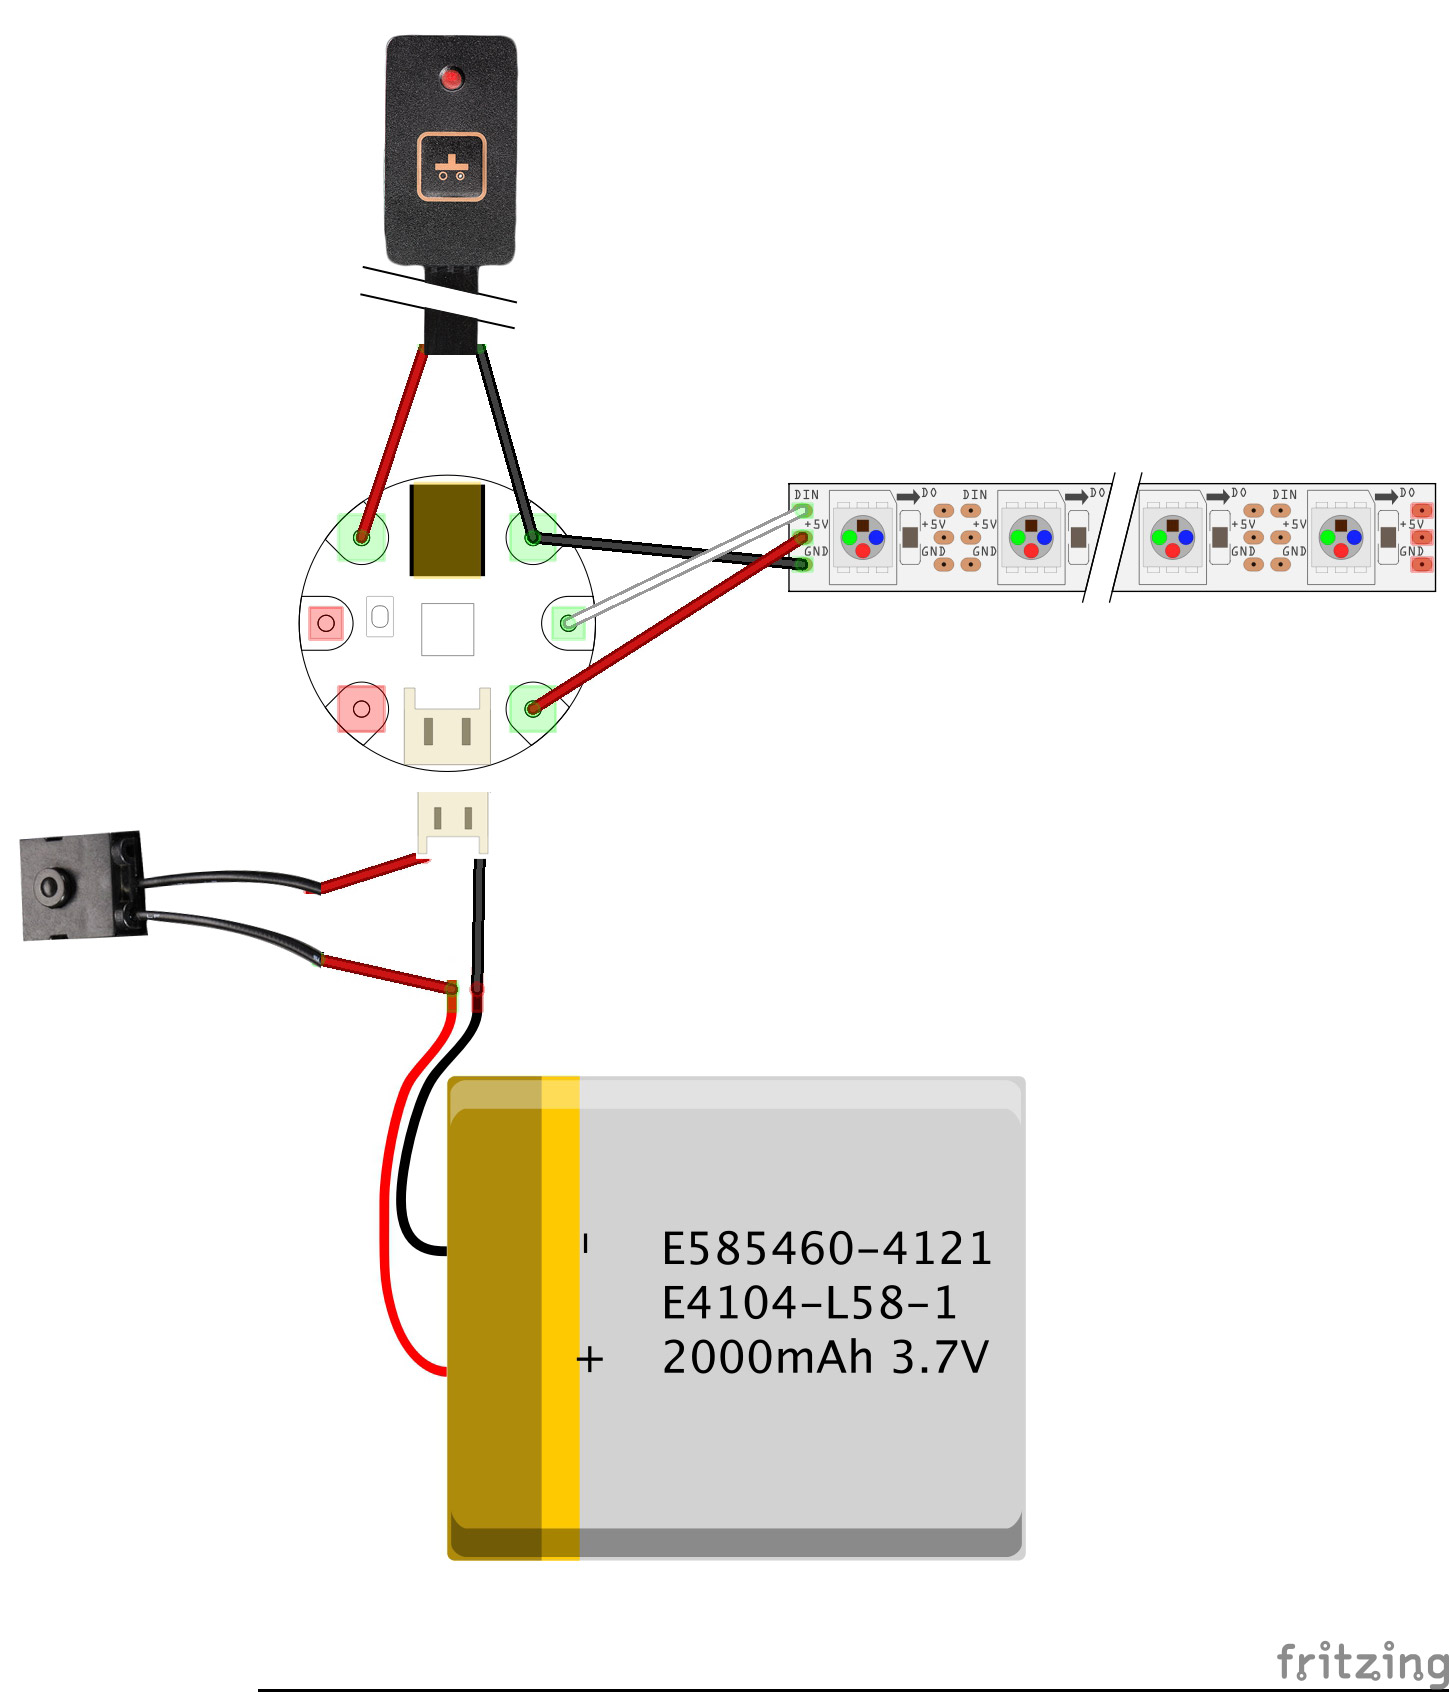 leds_glowfur_scarf2_bb.jpg